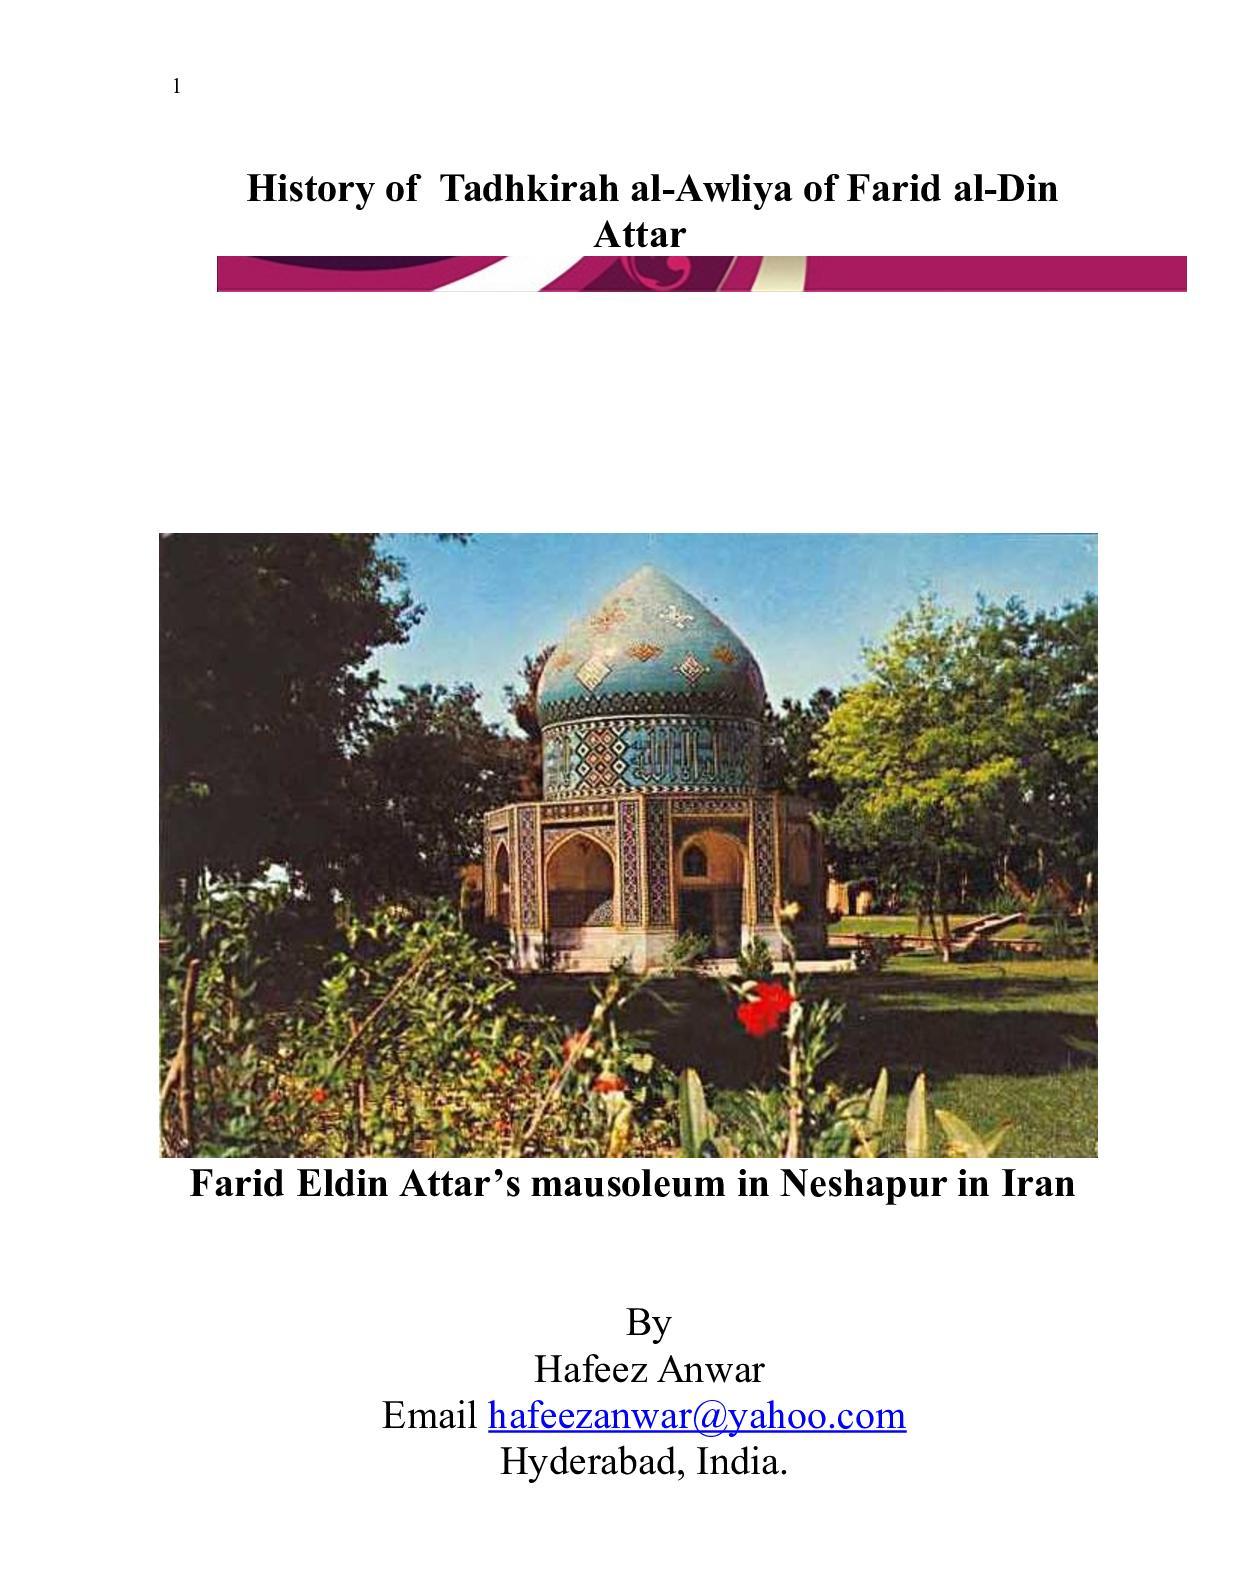 al-Shebli from the Tadhkirat al-Awliya of Farid al-Din Attar